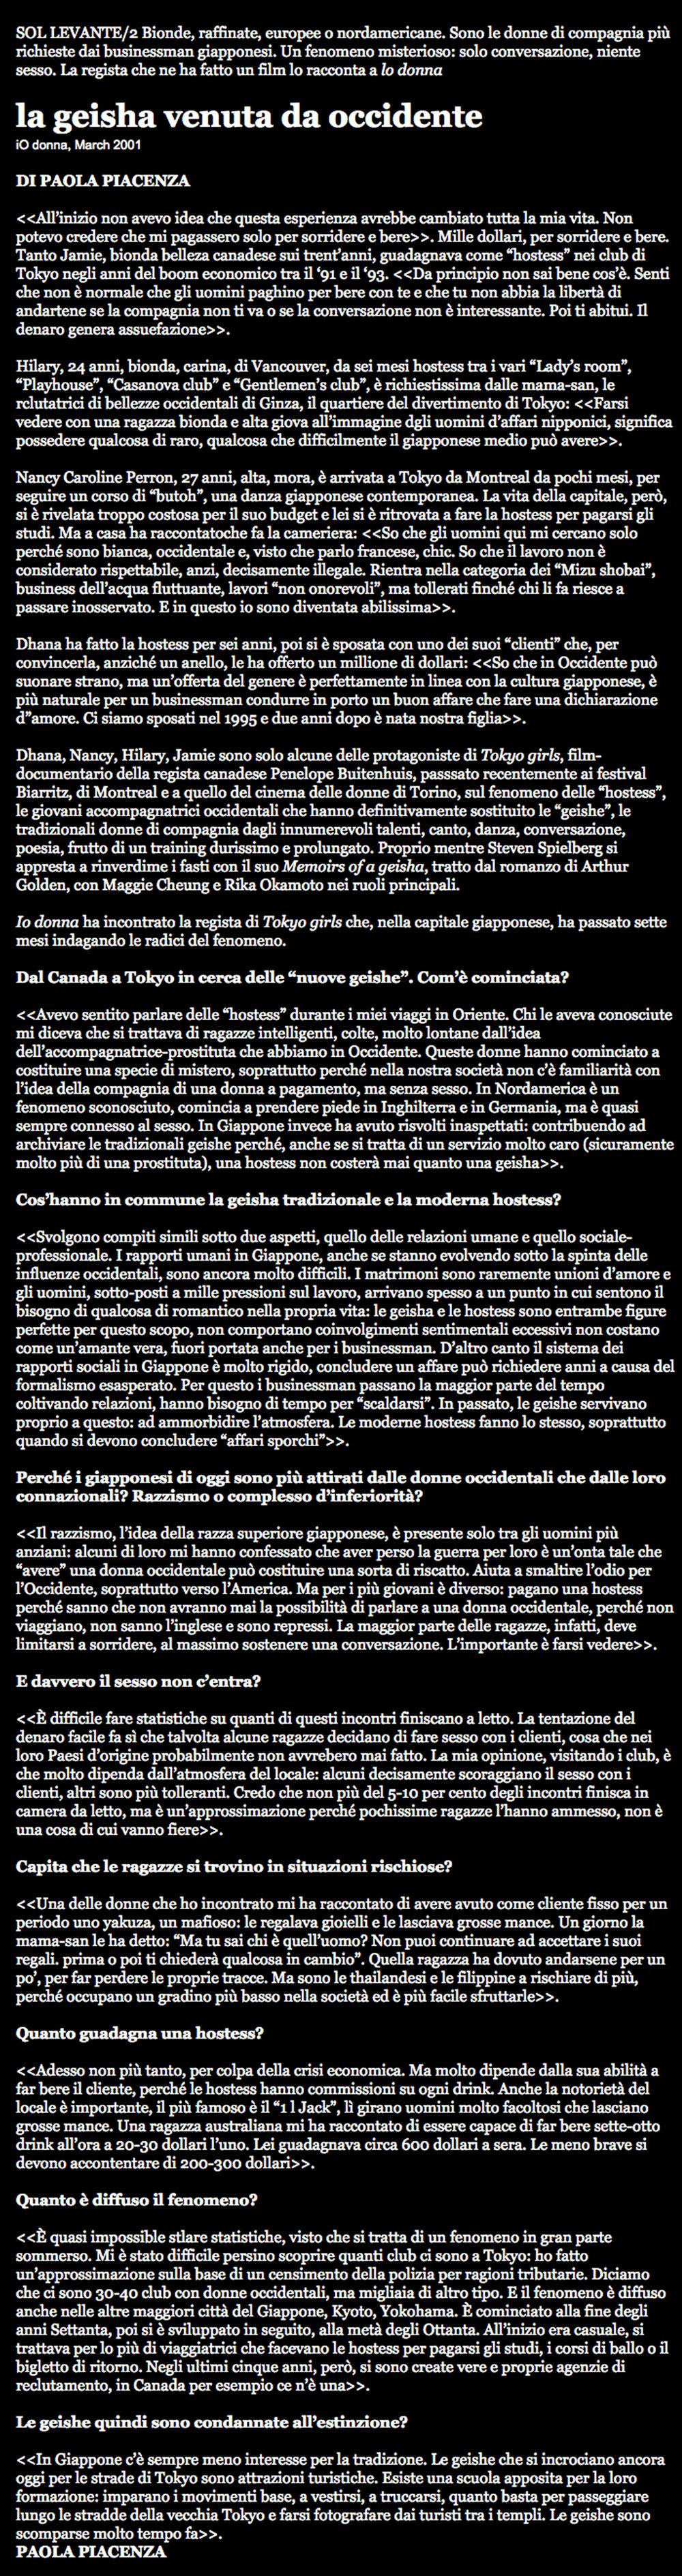 PB_DI_PAOLA_PIACENZA_article.jpg